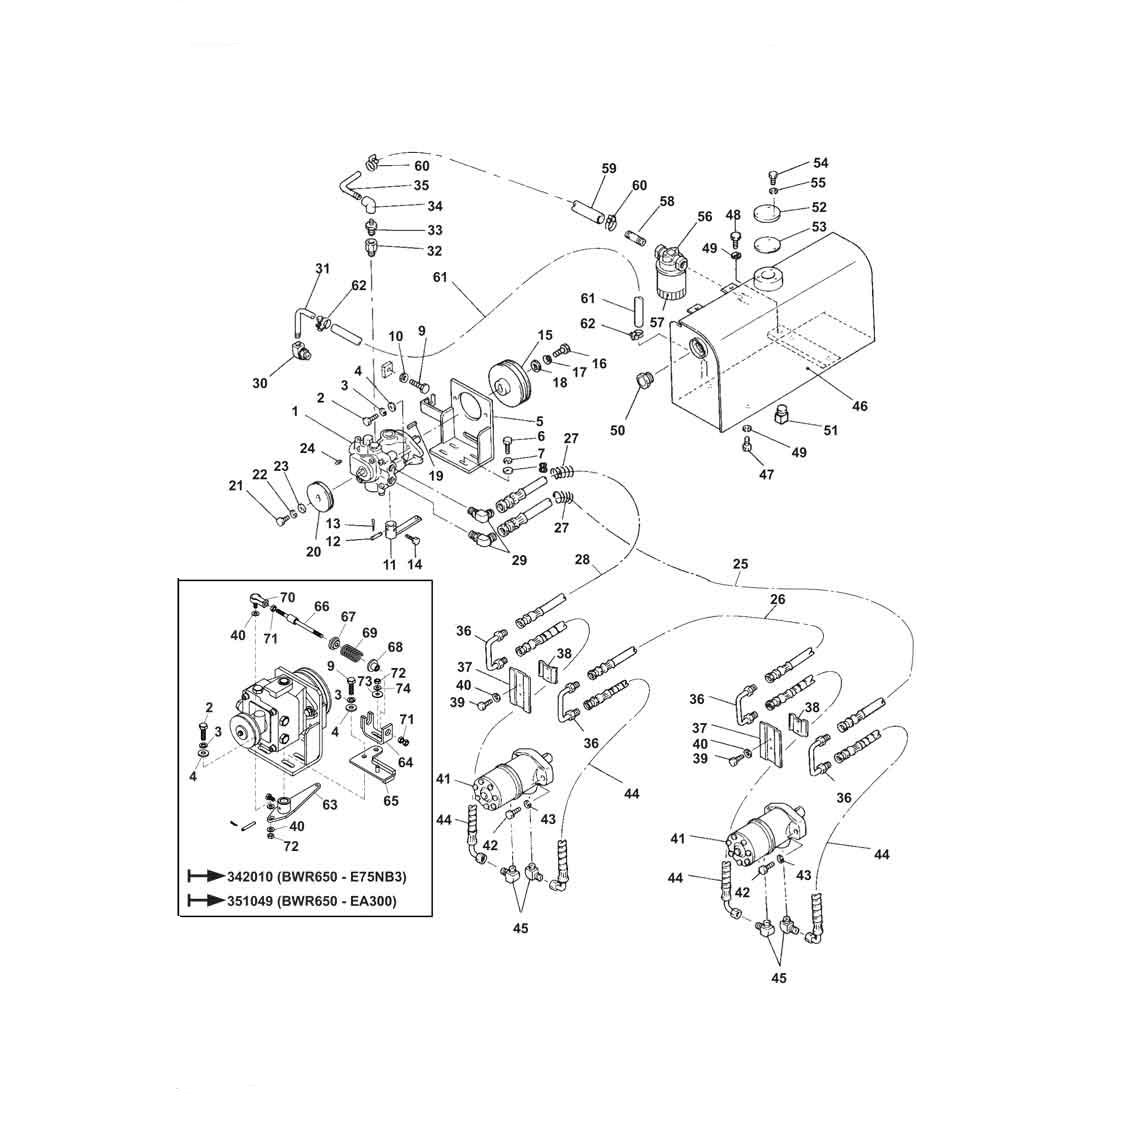 Bwr650roller Oil Unit Belle Group Roller Compactor Parts